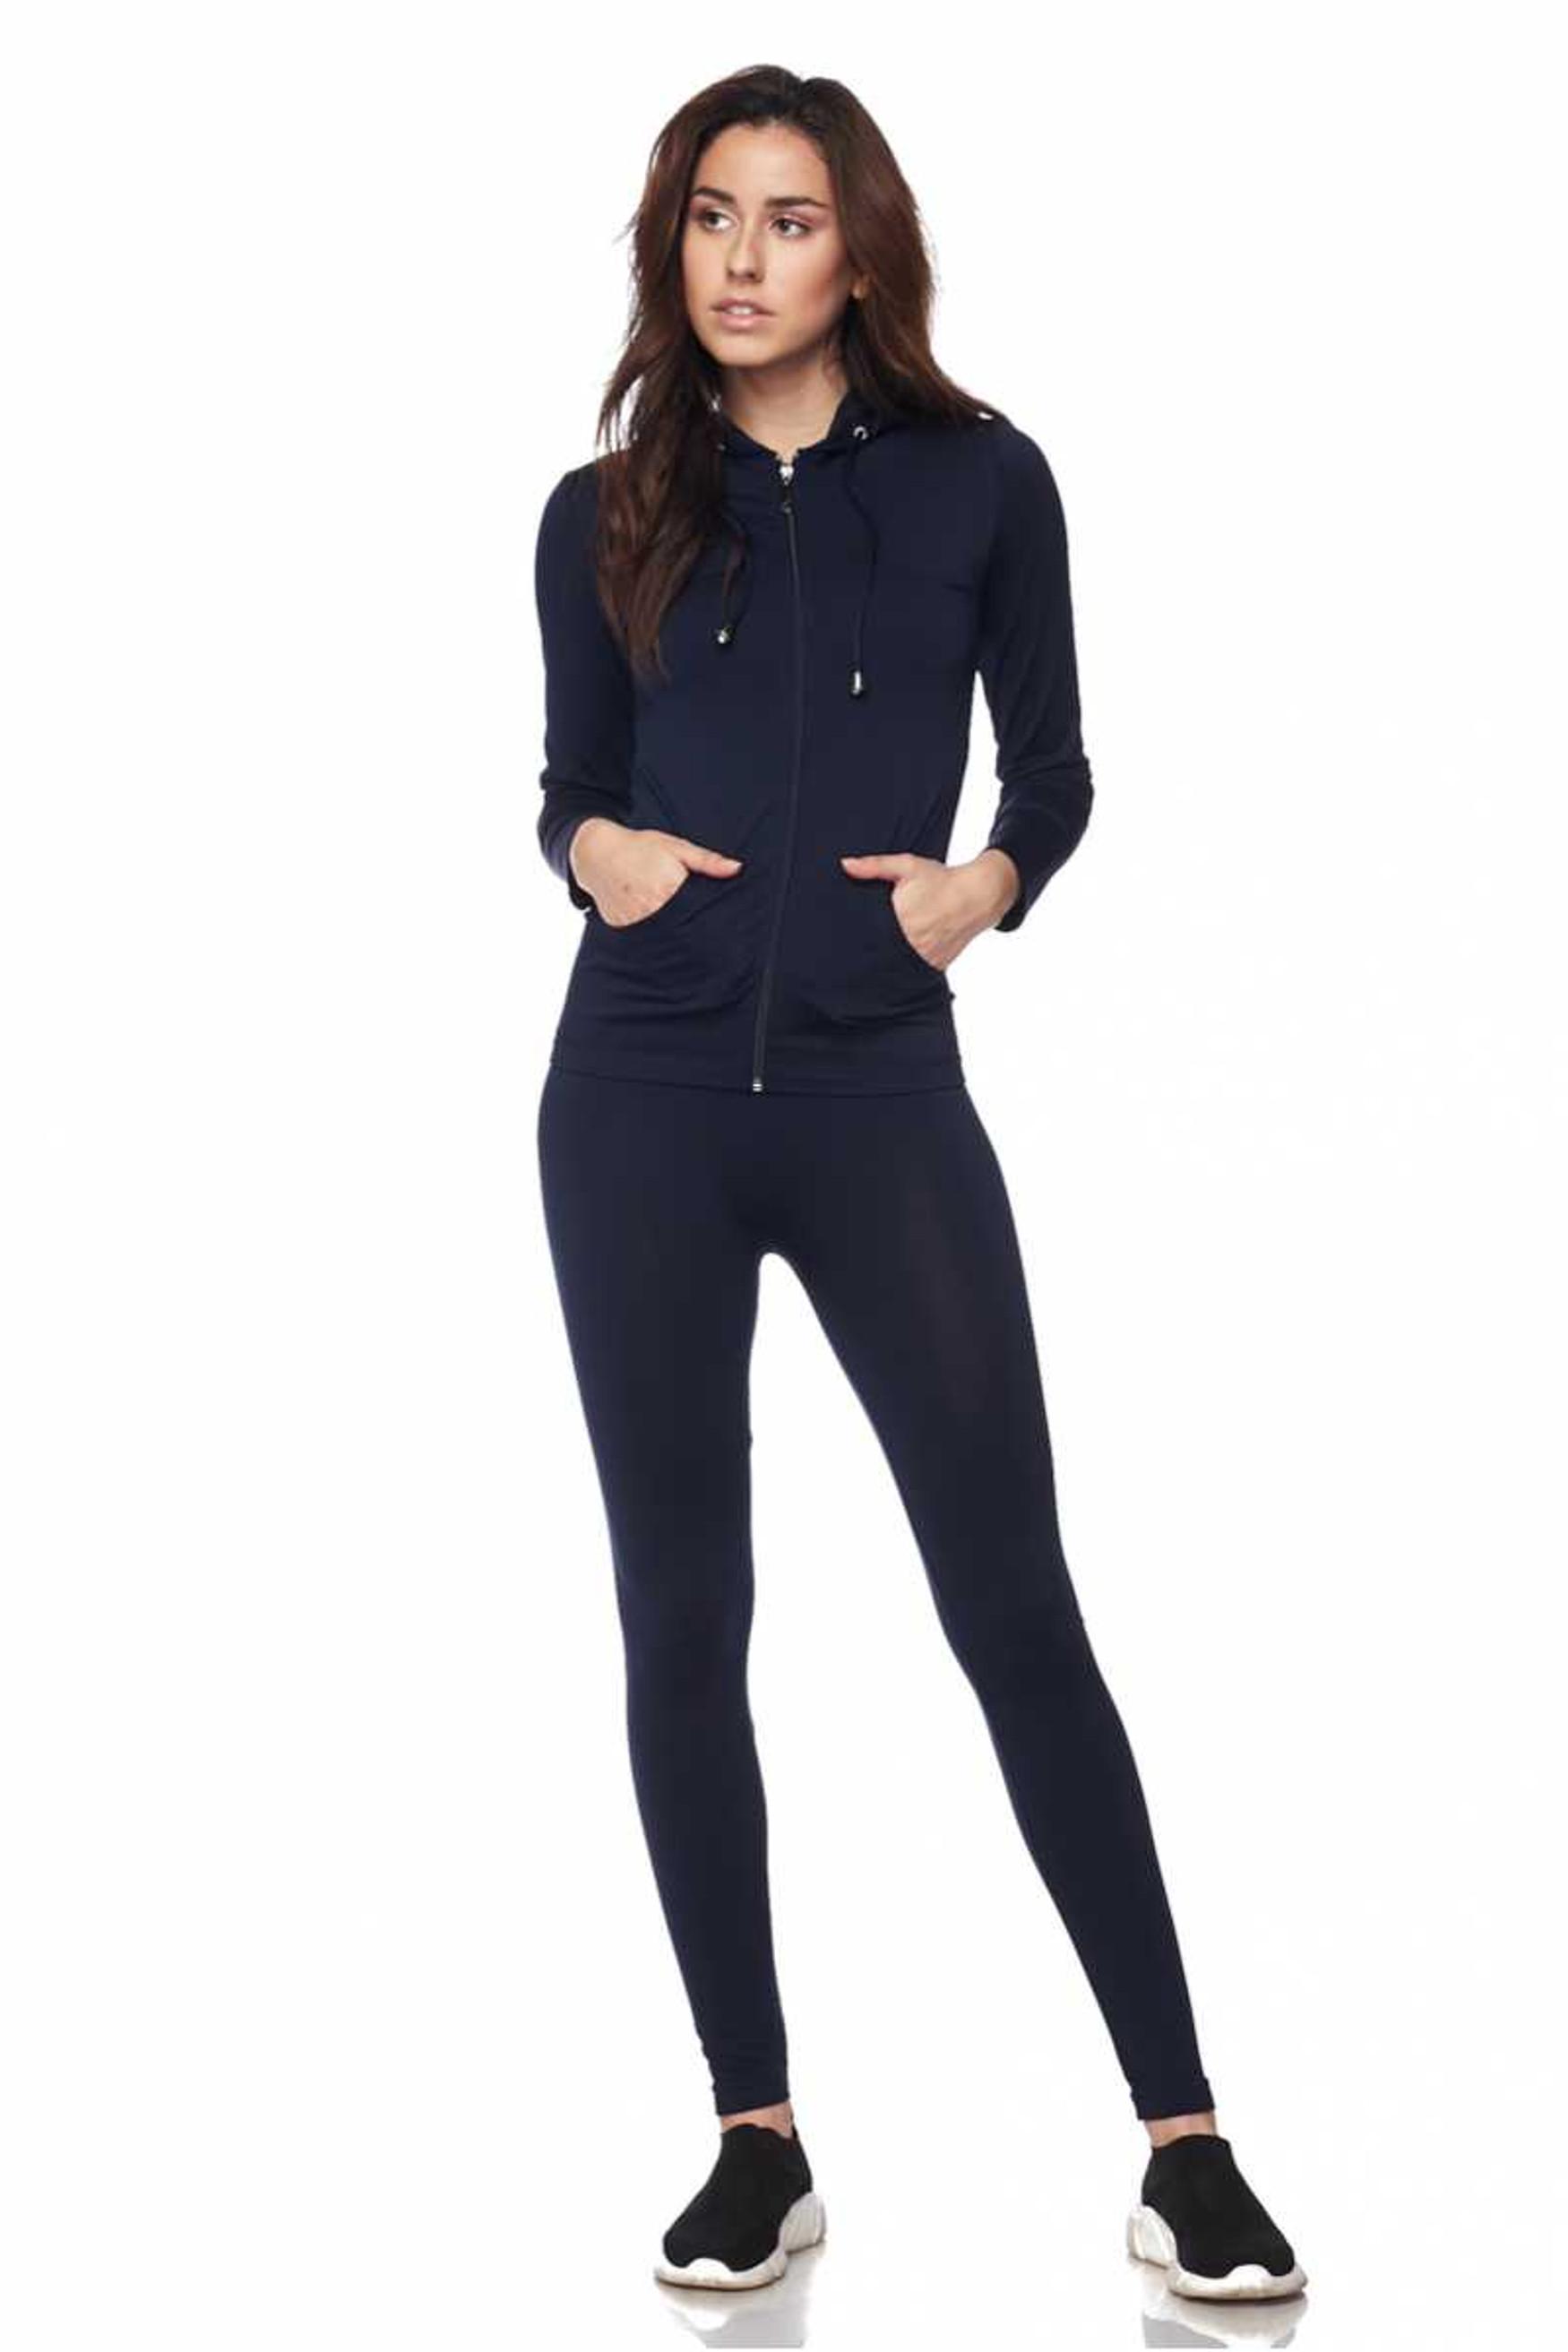 Premium Zipper Hoodie Jacket and Legging Set - Plus Size